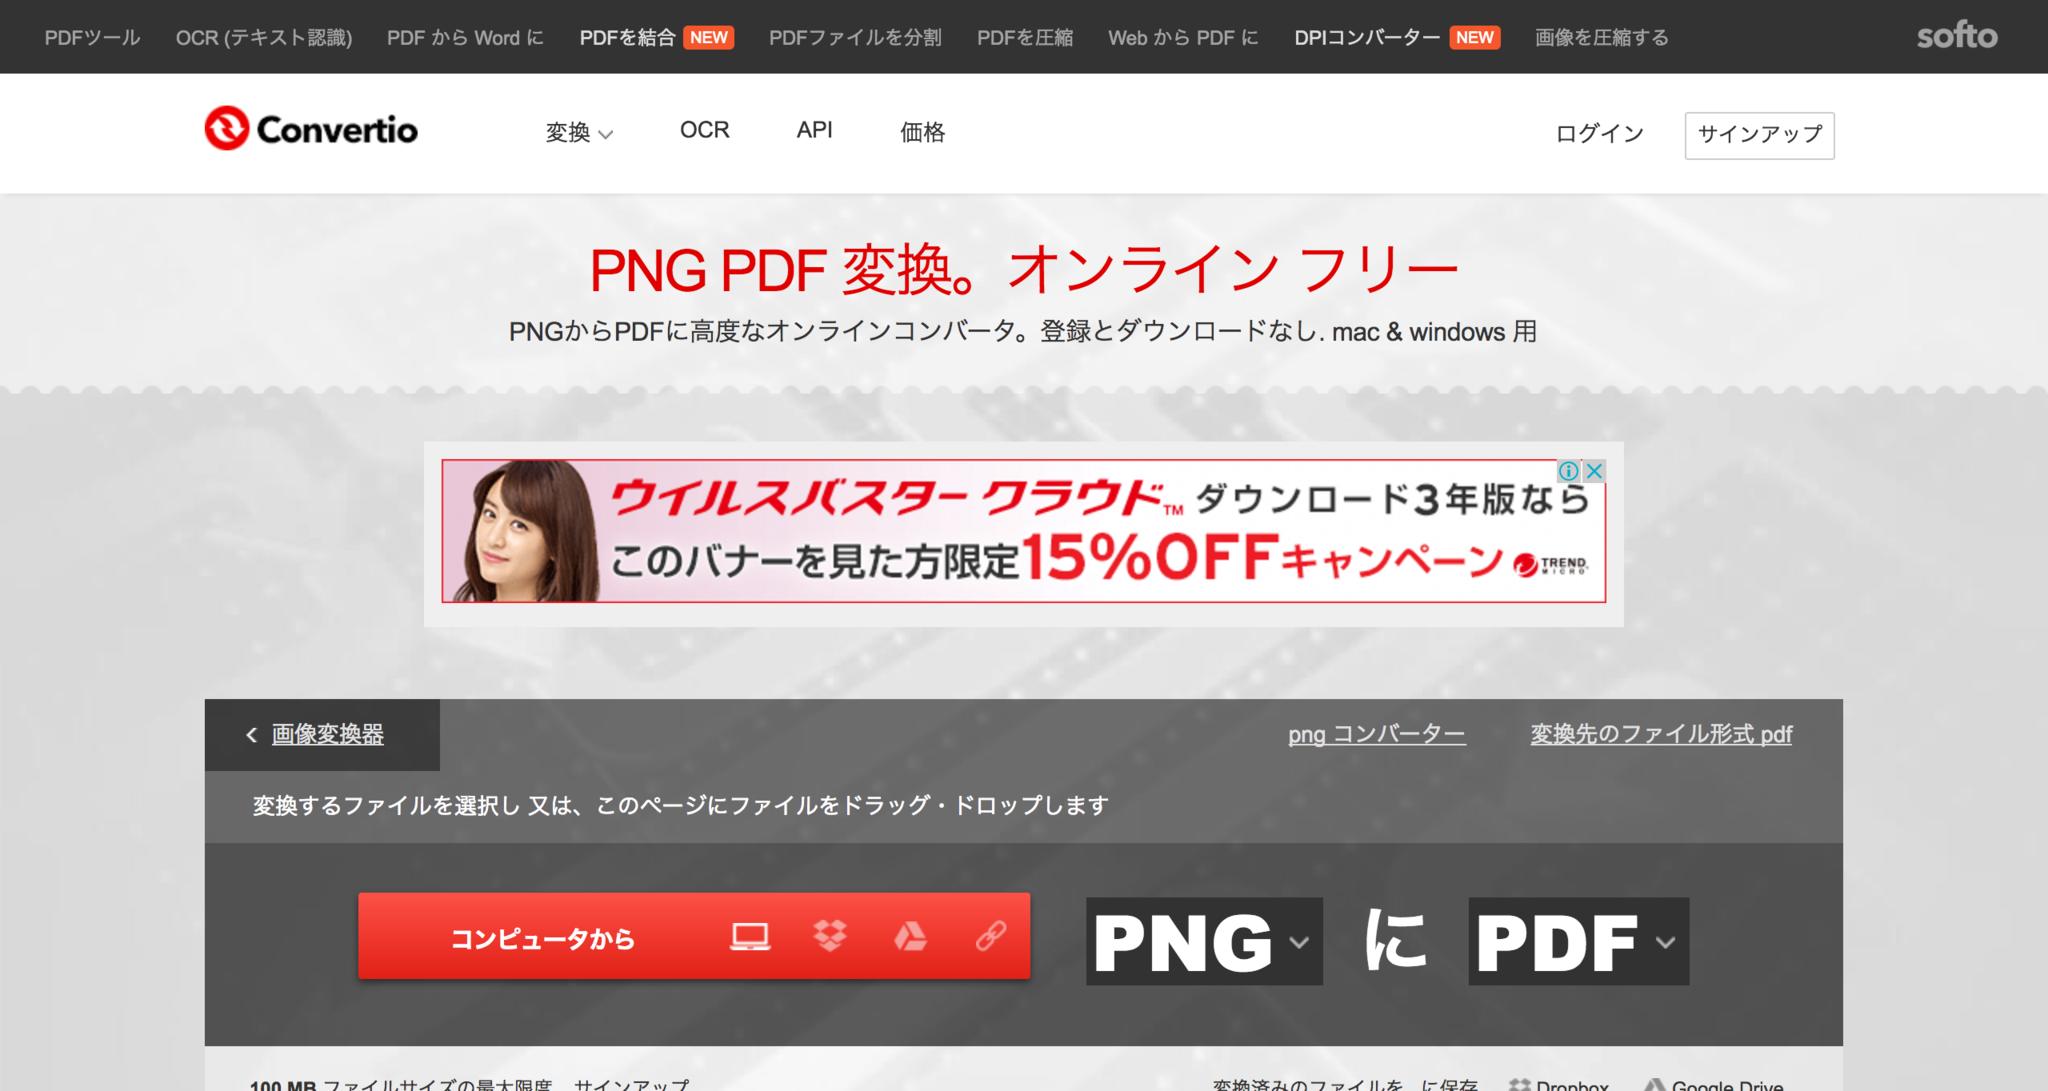 PNG_PDF_変換。オンライン_フリー_—_Convertio.png